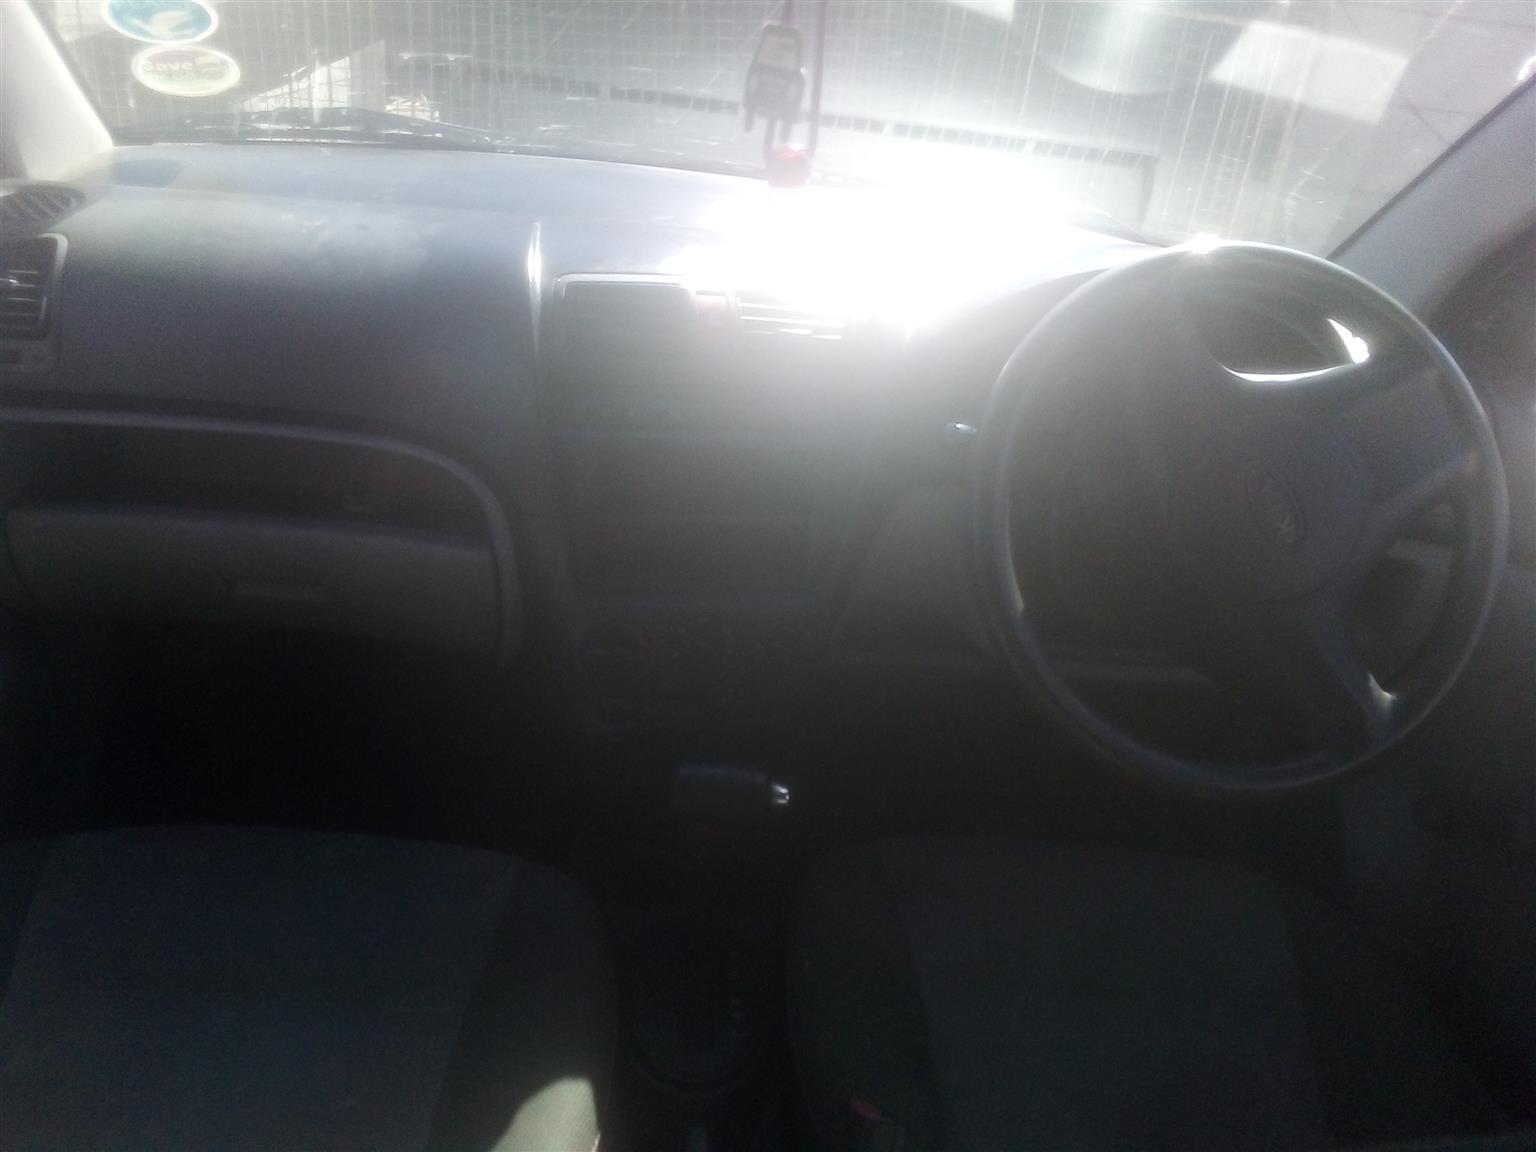 Kia Picanto lx 2004 Automatic